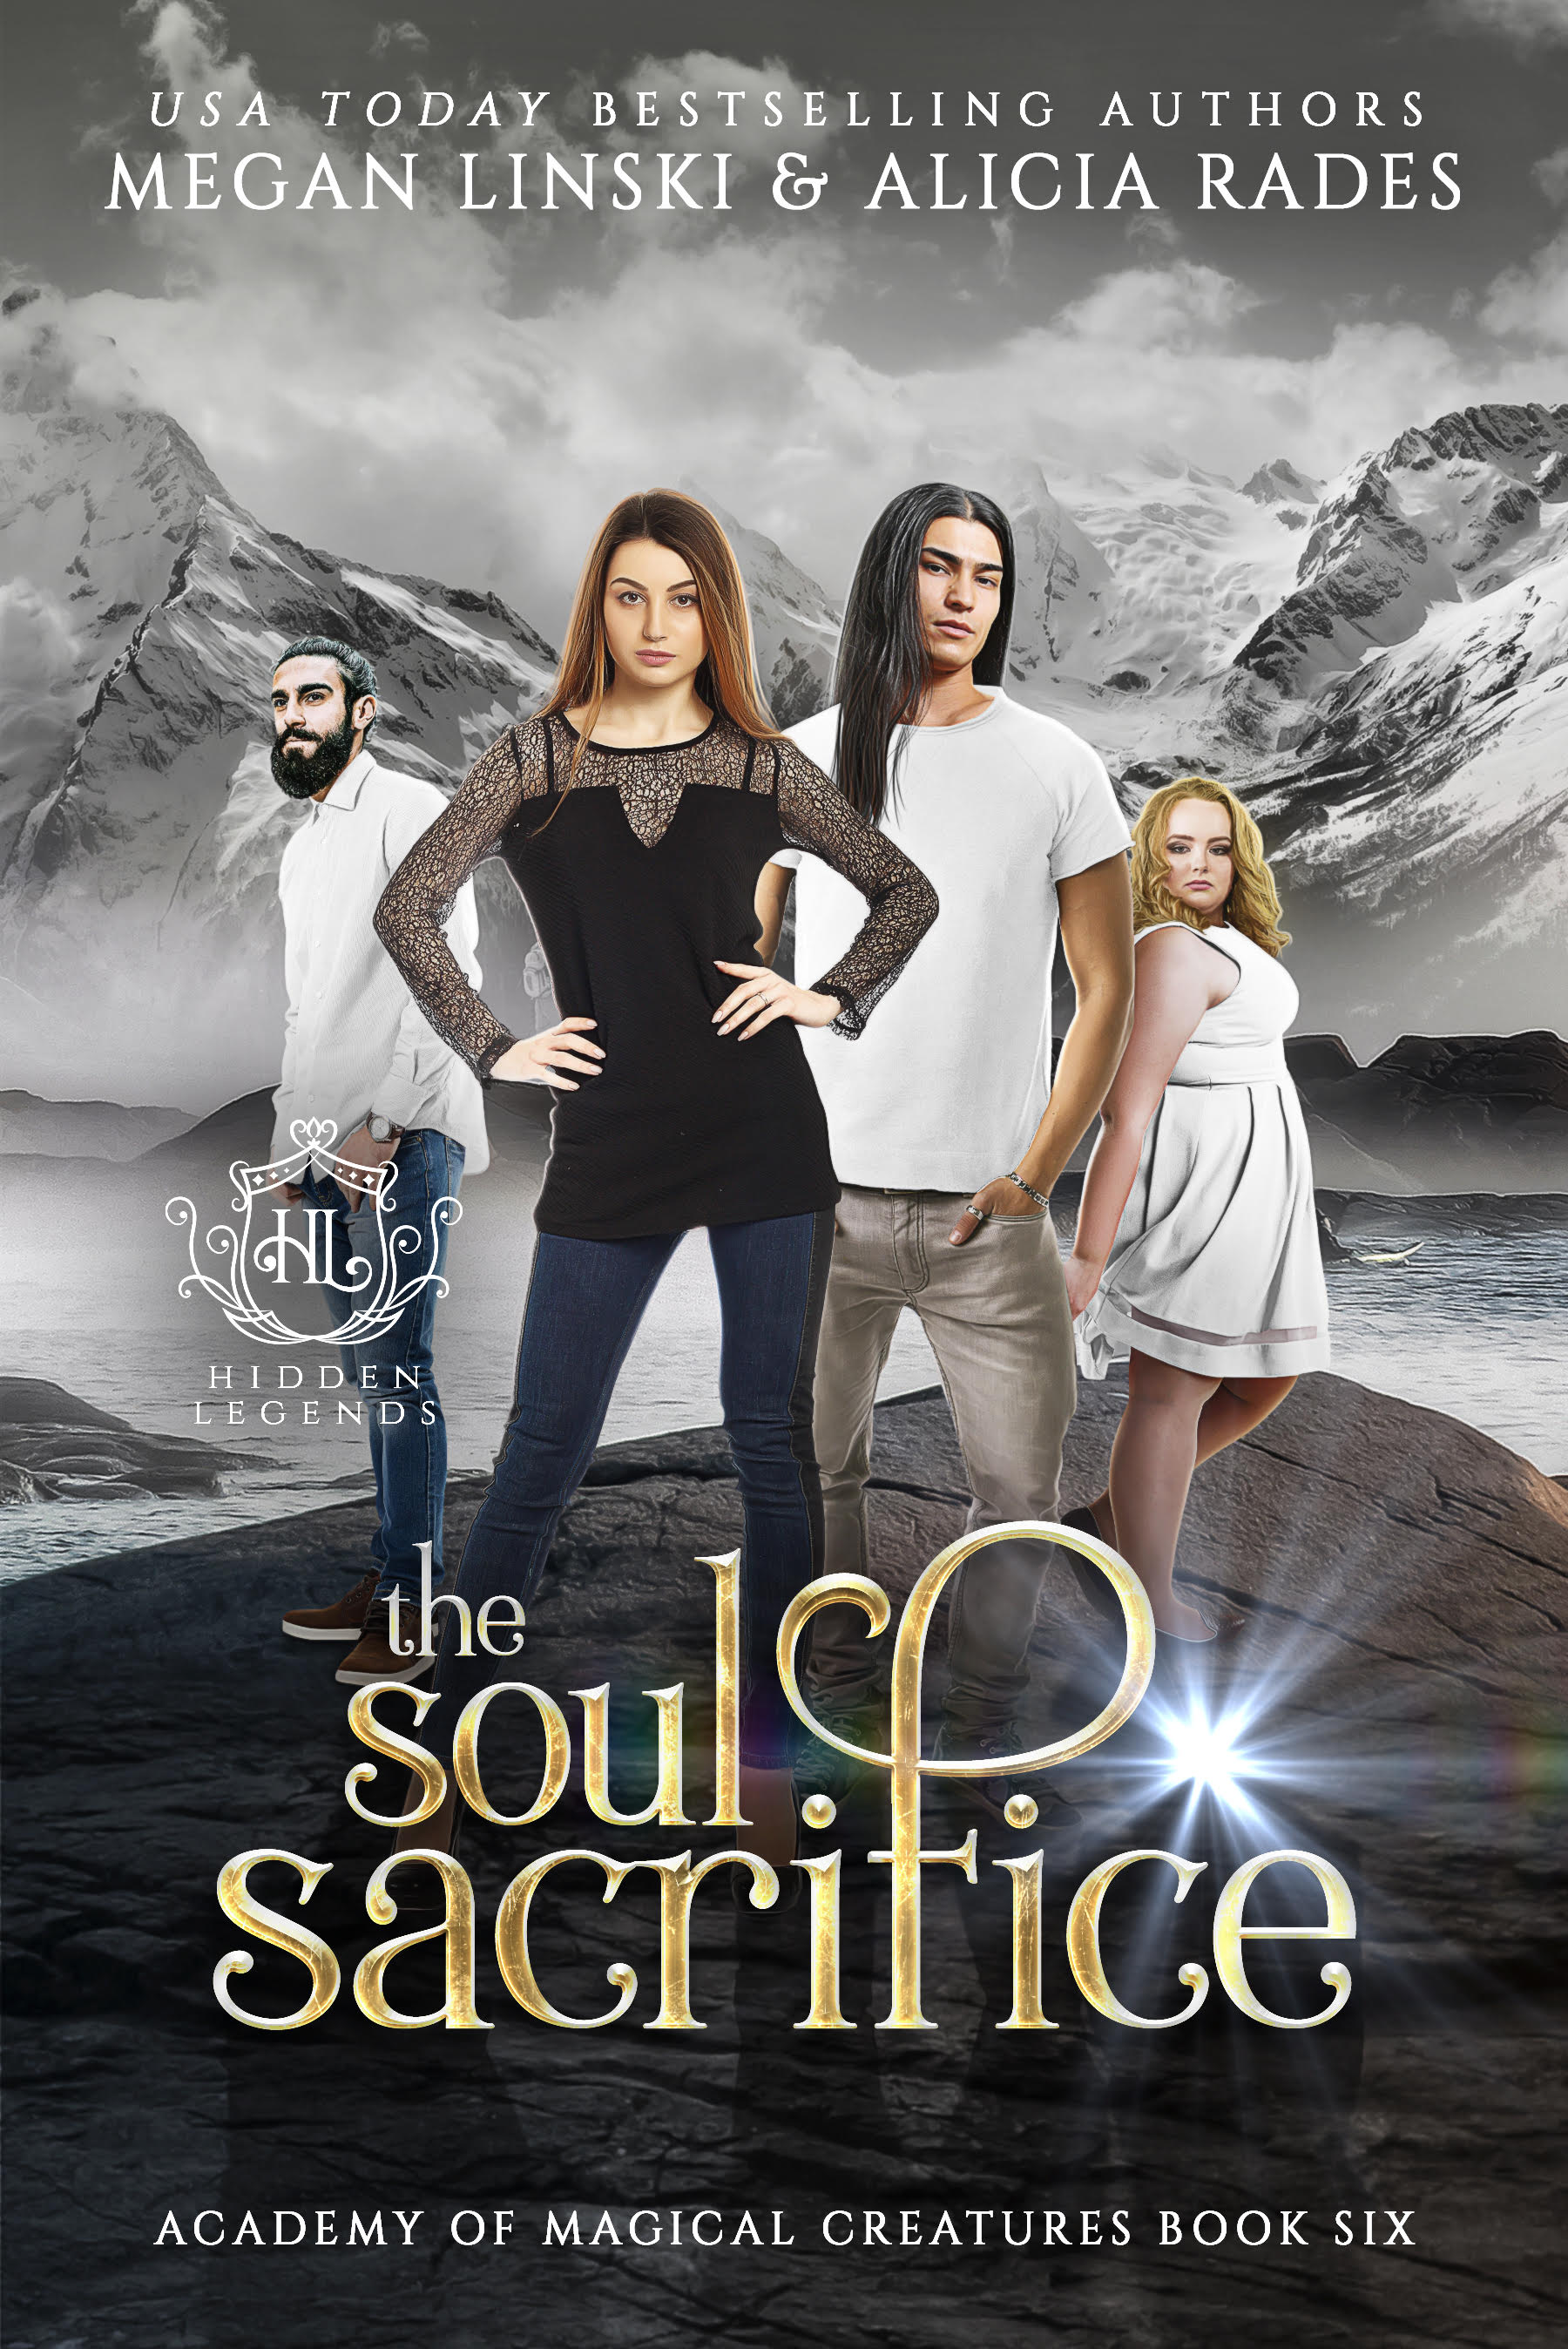 The Soul Sacrifice